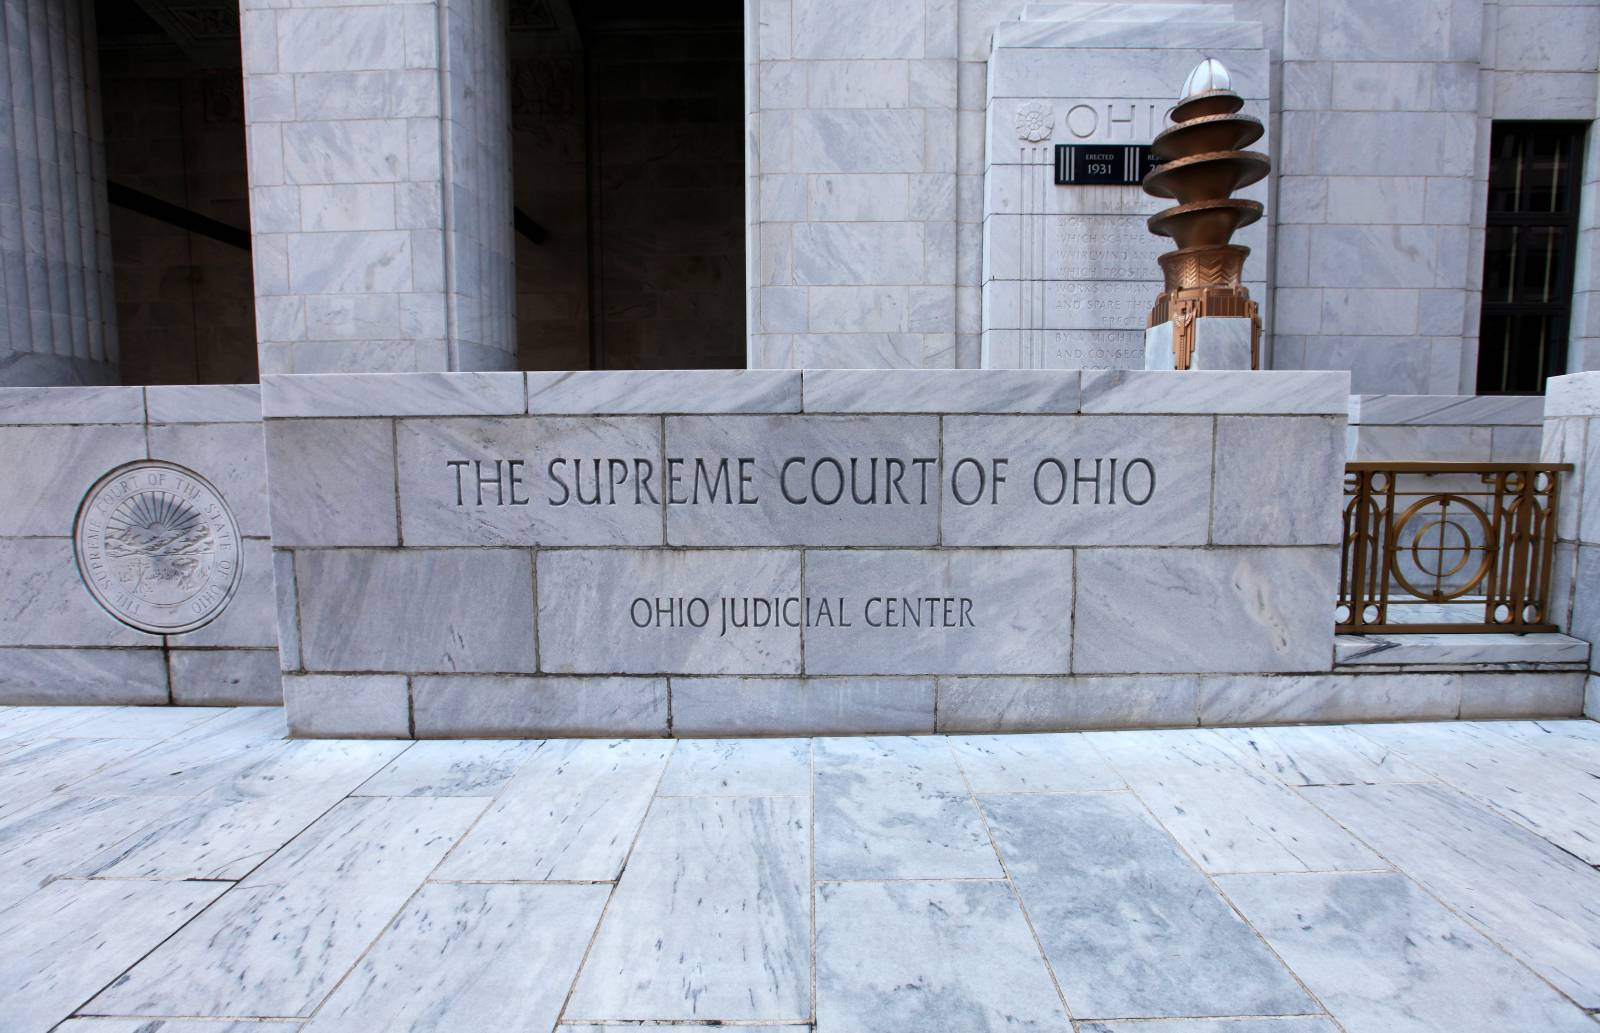 The Supreme Court Of Ohio on May 18, 2014 in Columbus, Ohio.